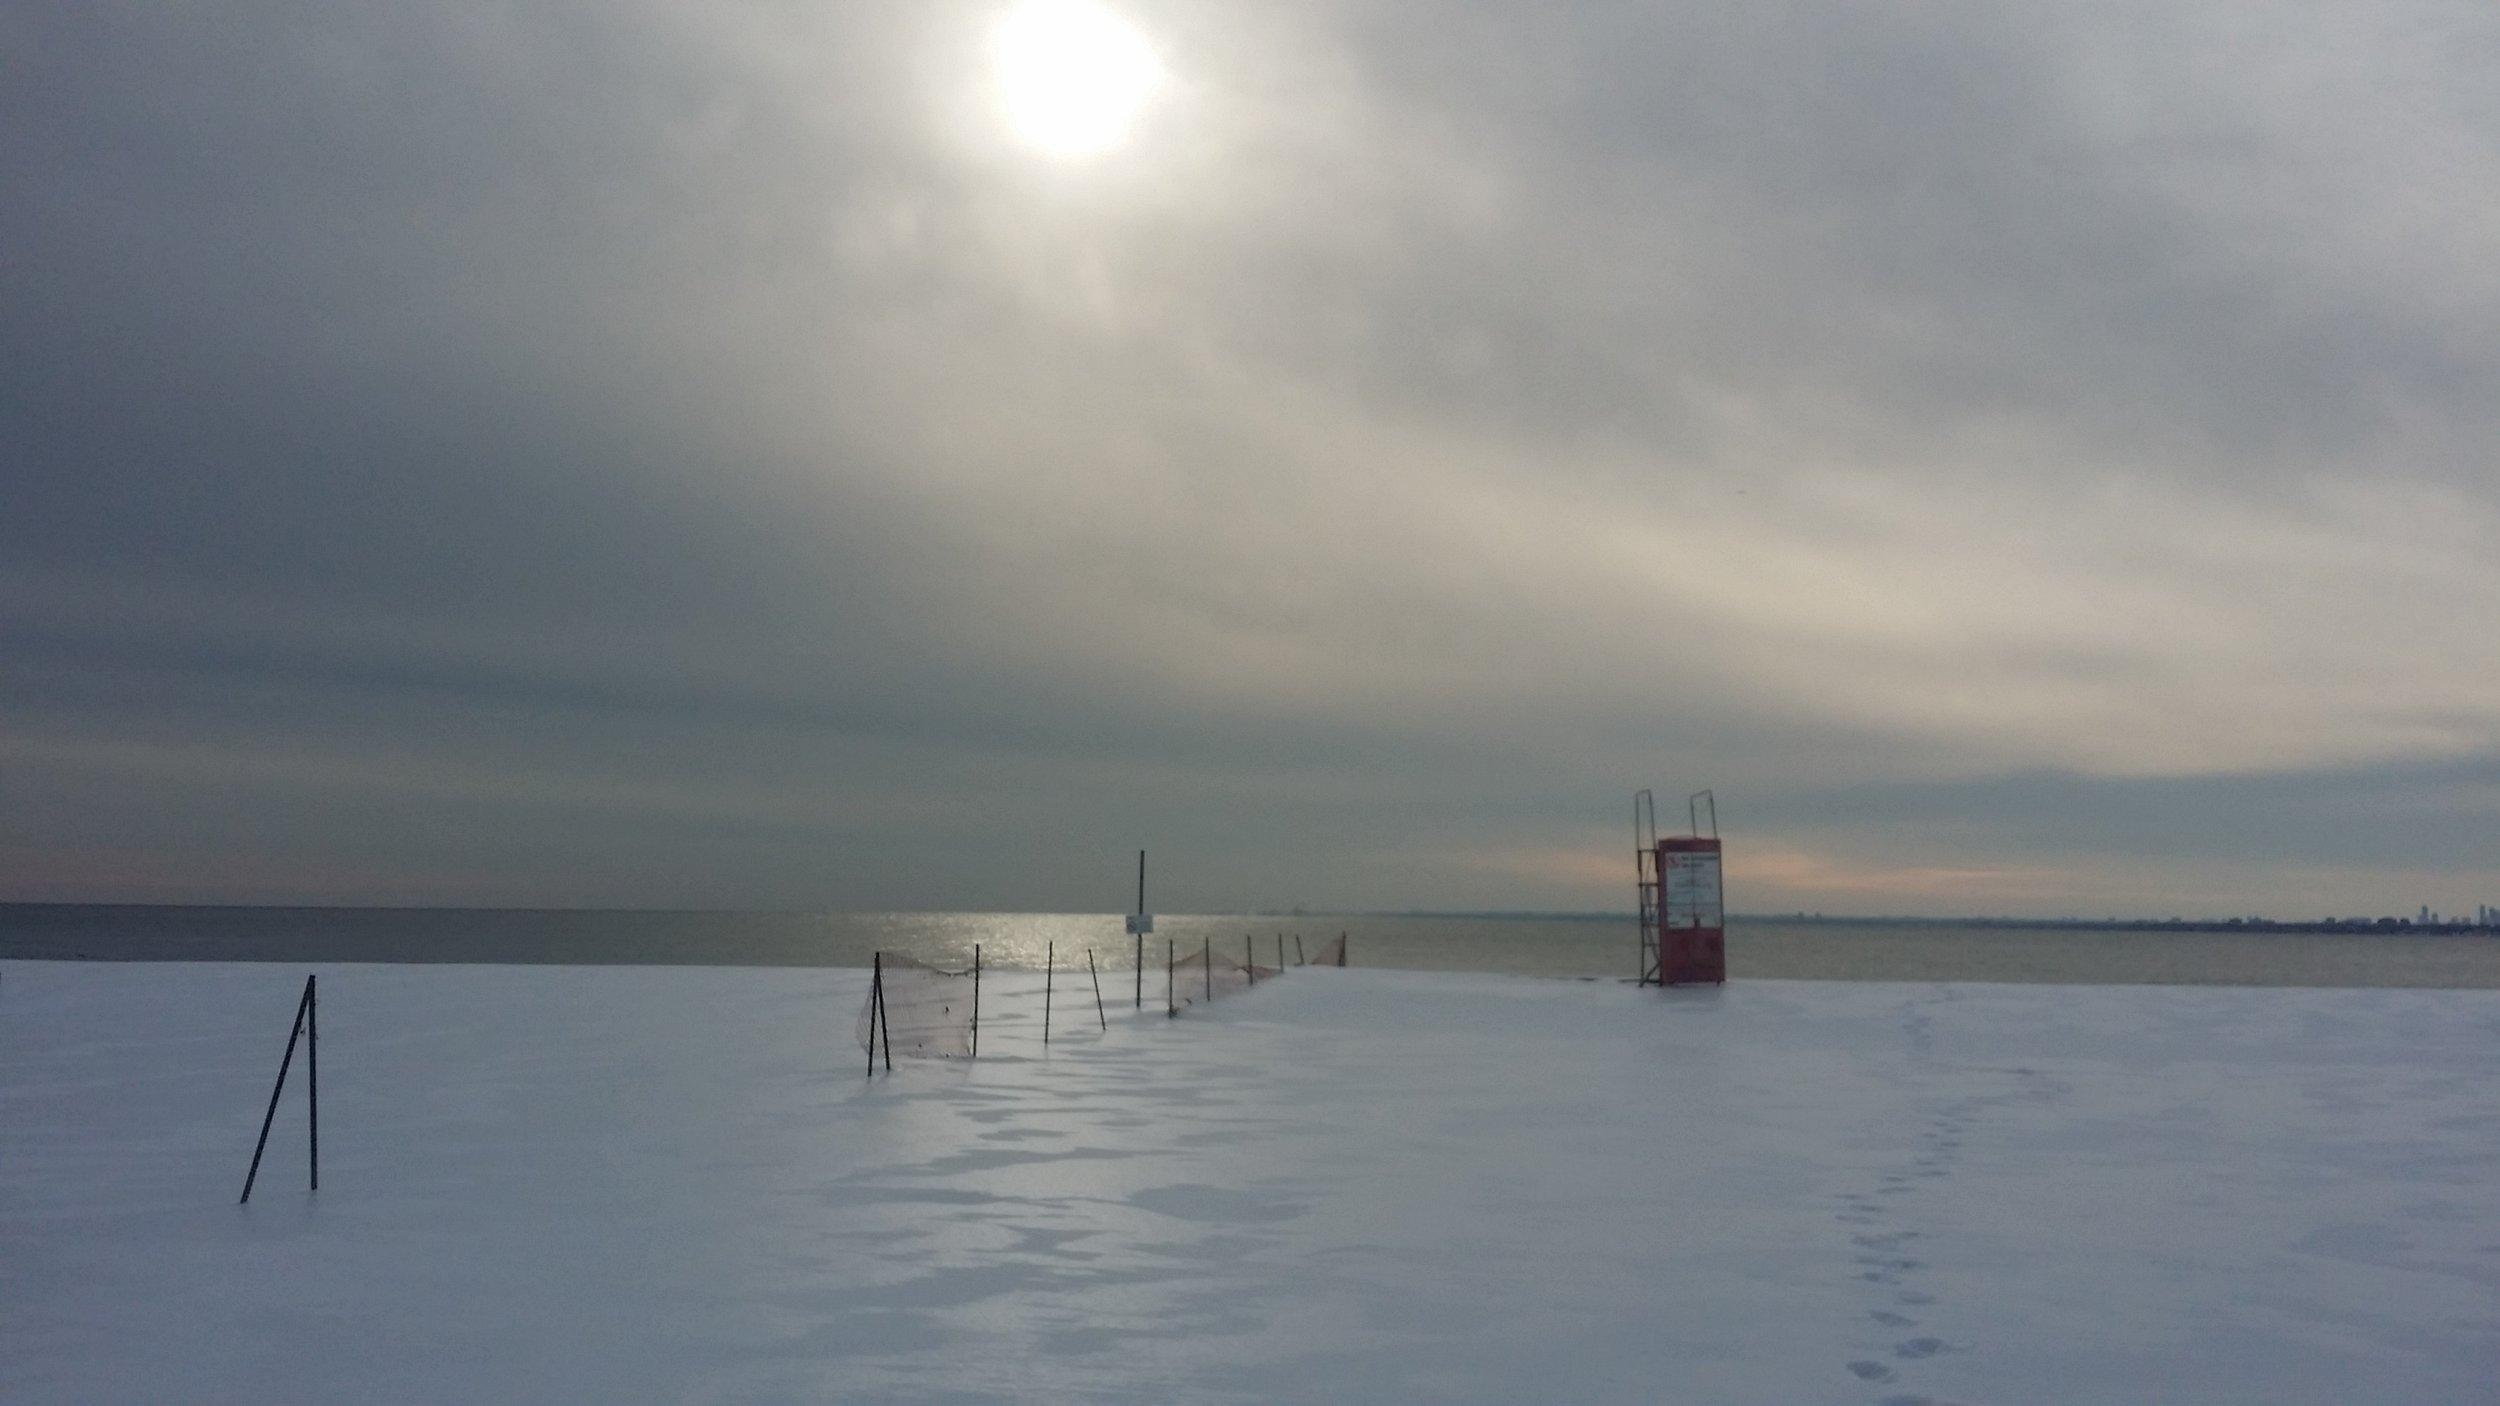 Toronto Island, February 2018, by Paul Baines